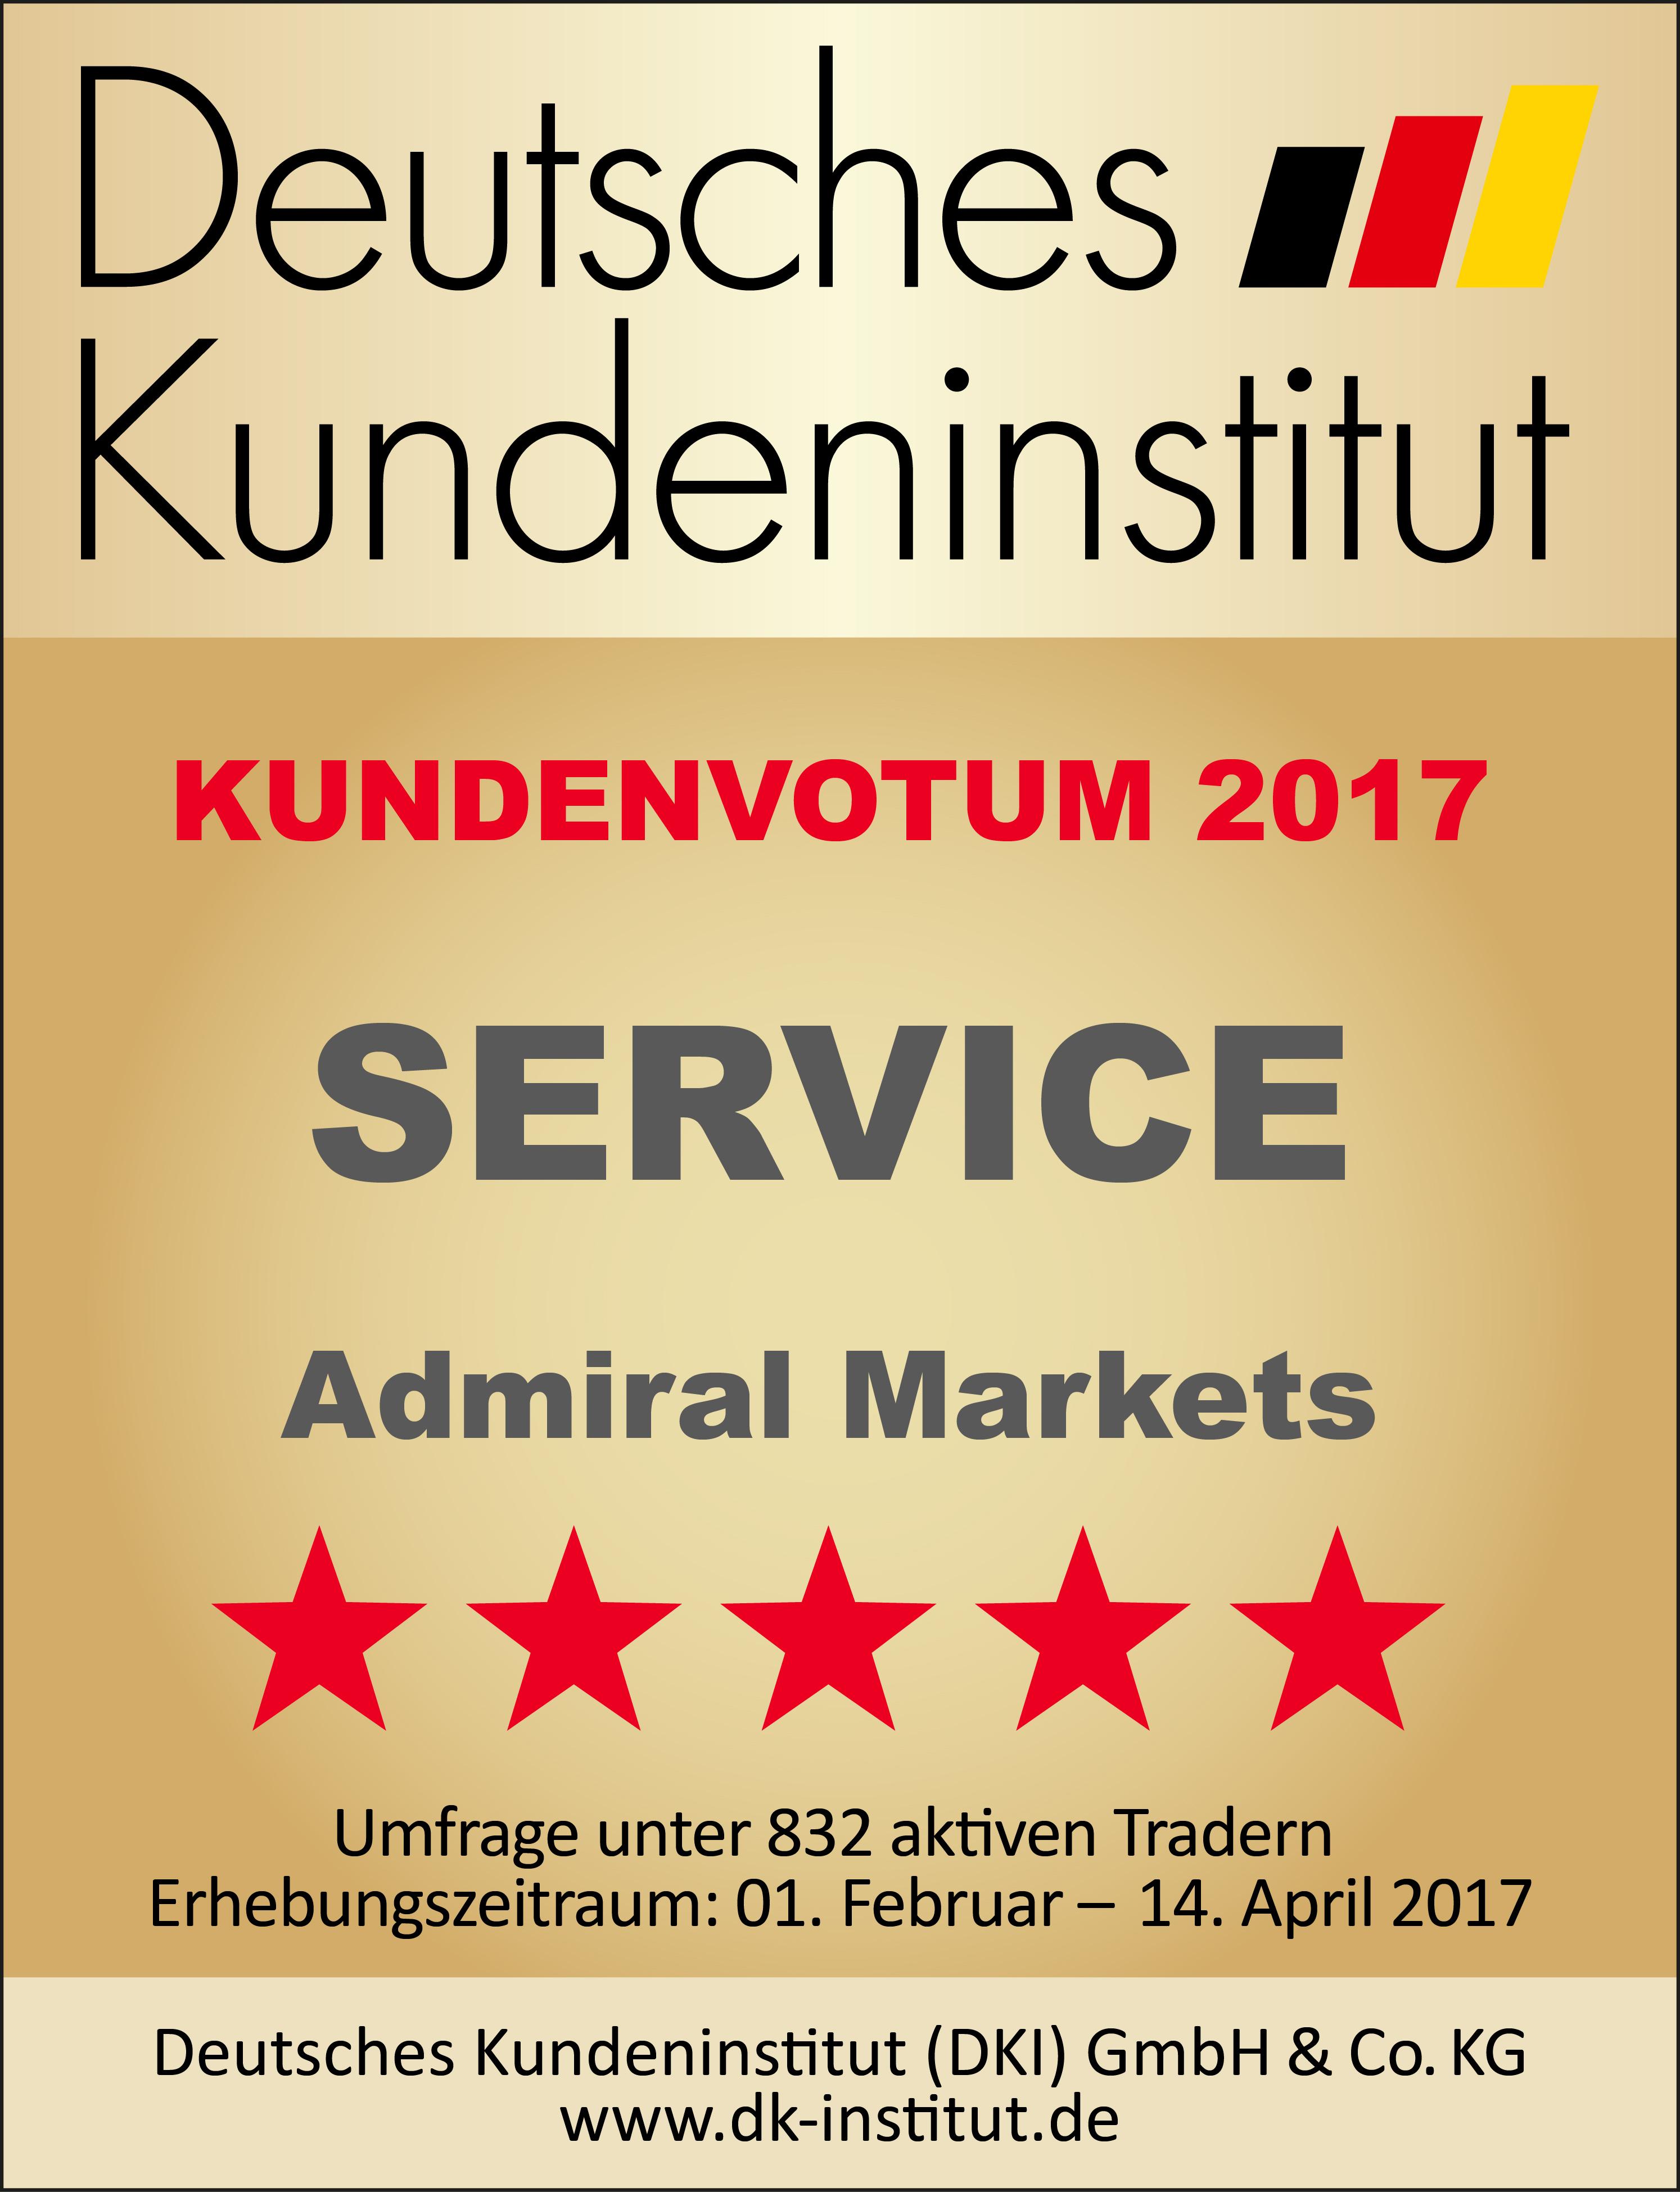 Admiral Markets Award